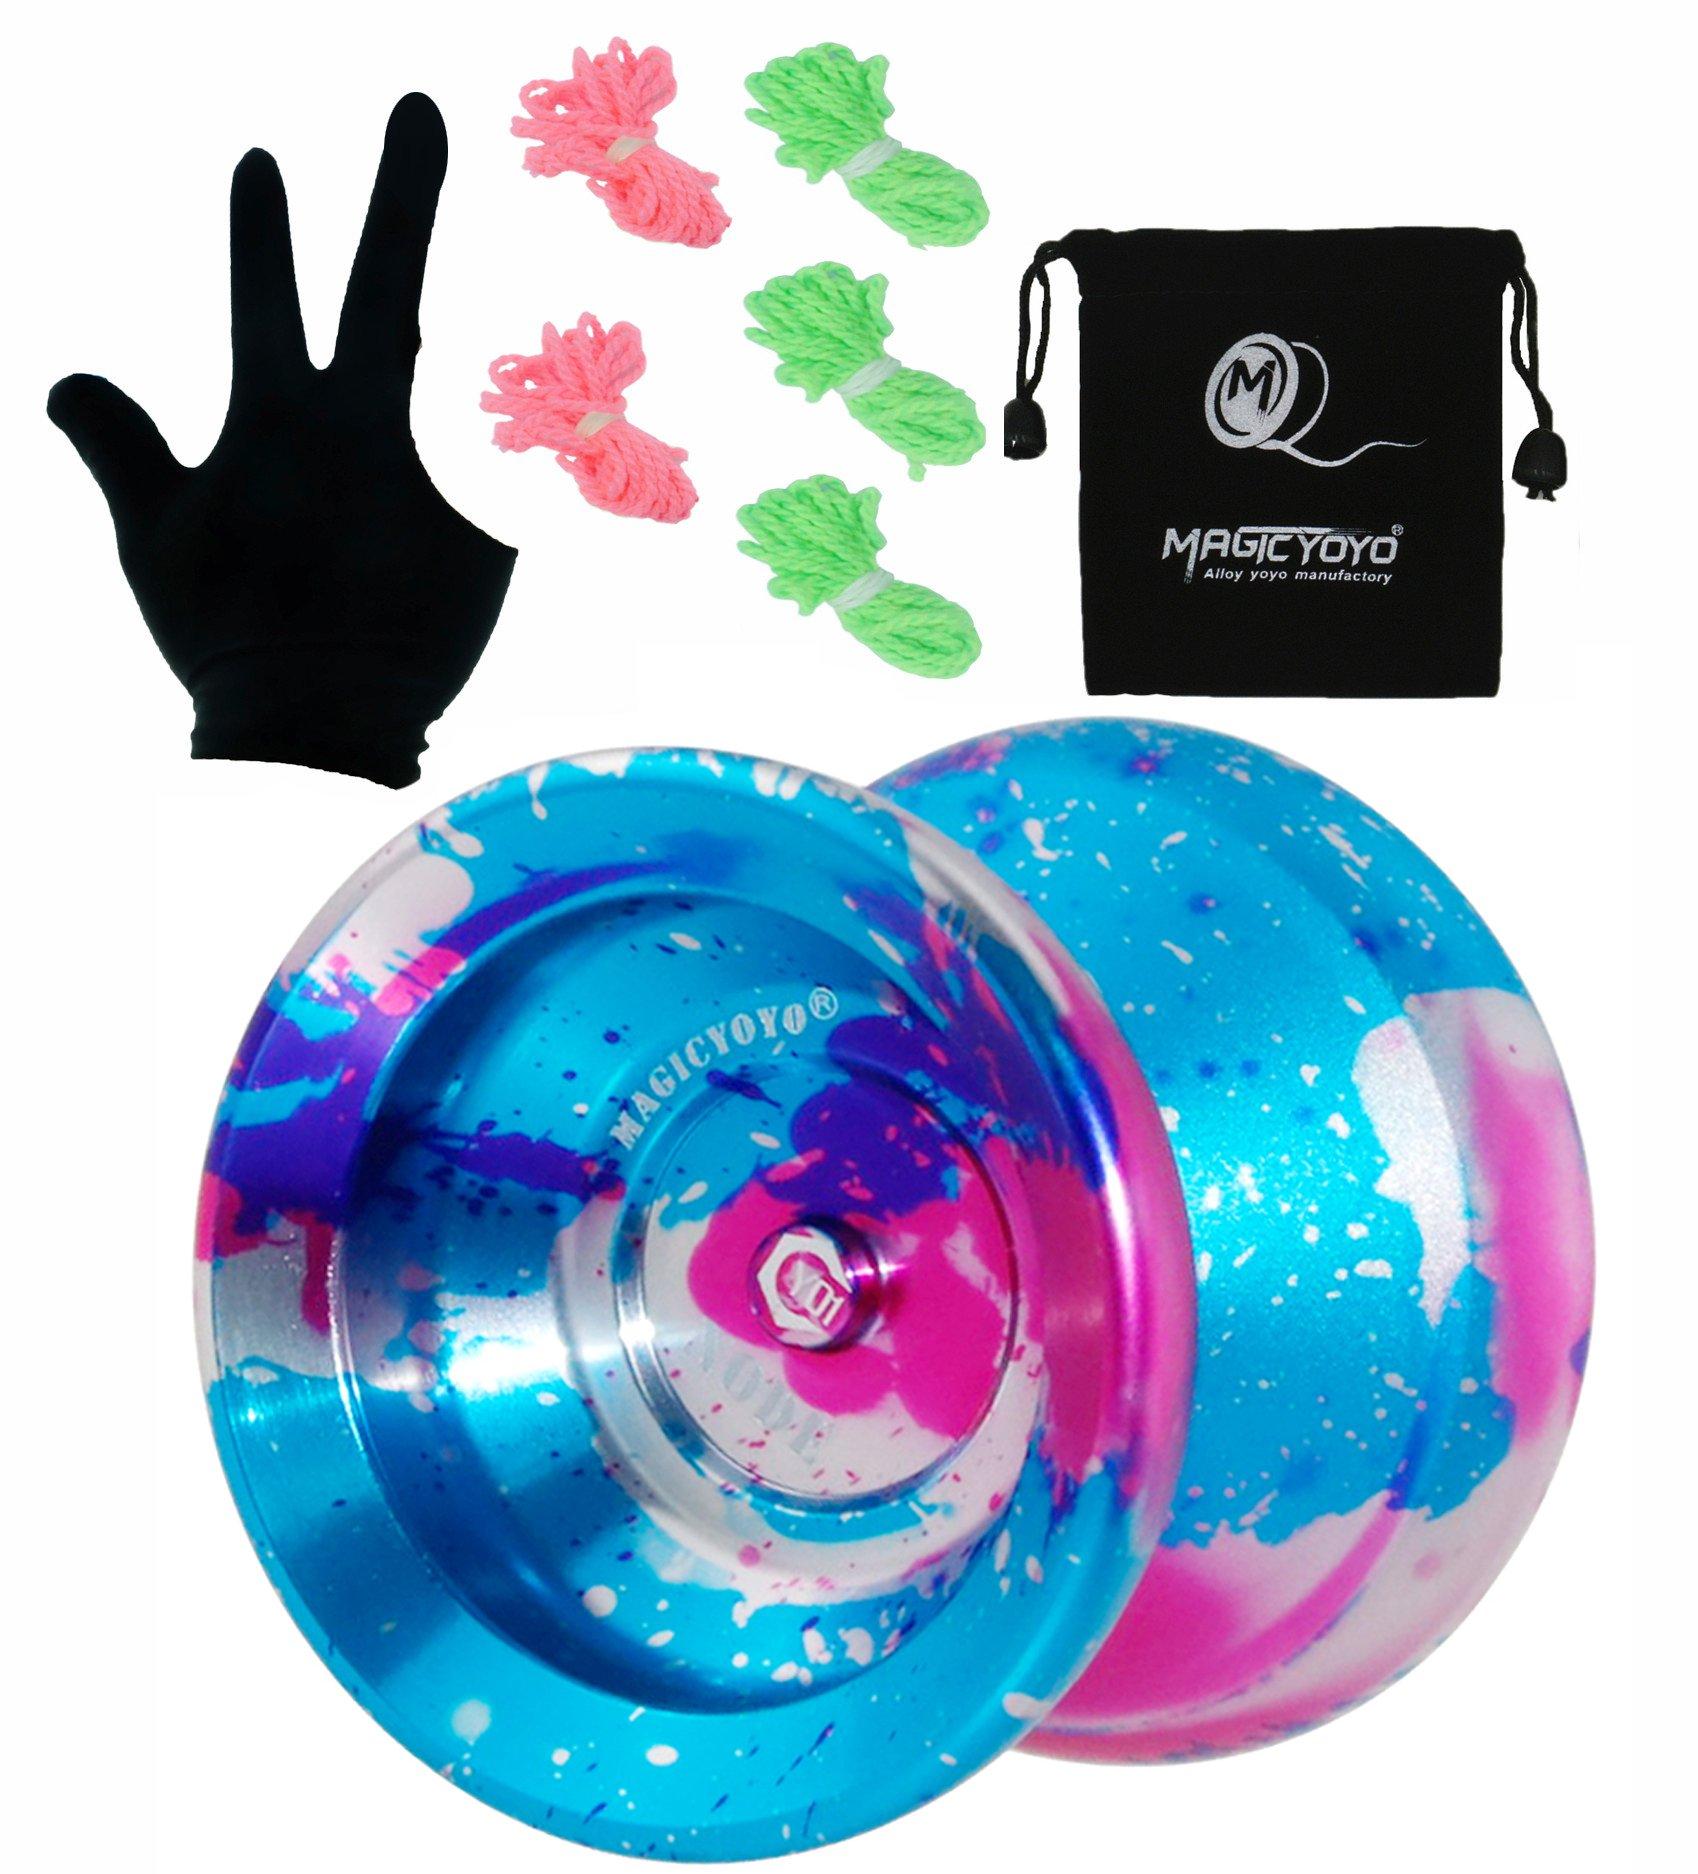 MAGICYOYO Professional Unresponsive Yoyo Y01 Node, Long Spinning Time Prettiest Yoyo with Glove, Yoyo Bag and 5 Replacement Yoyo Strings (Blue Splash Pink&Silver)